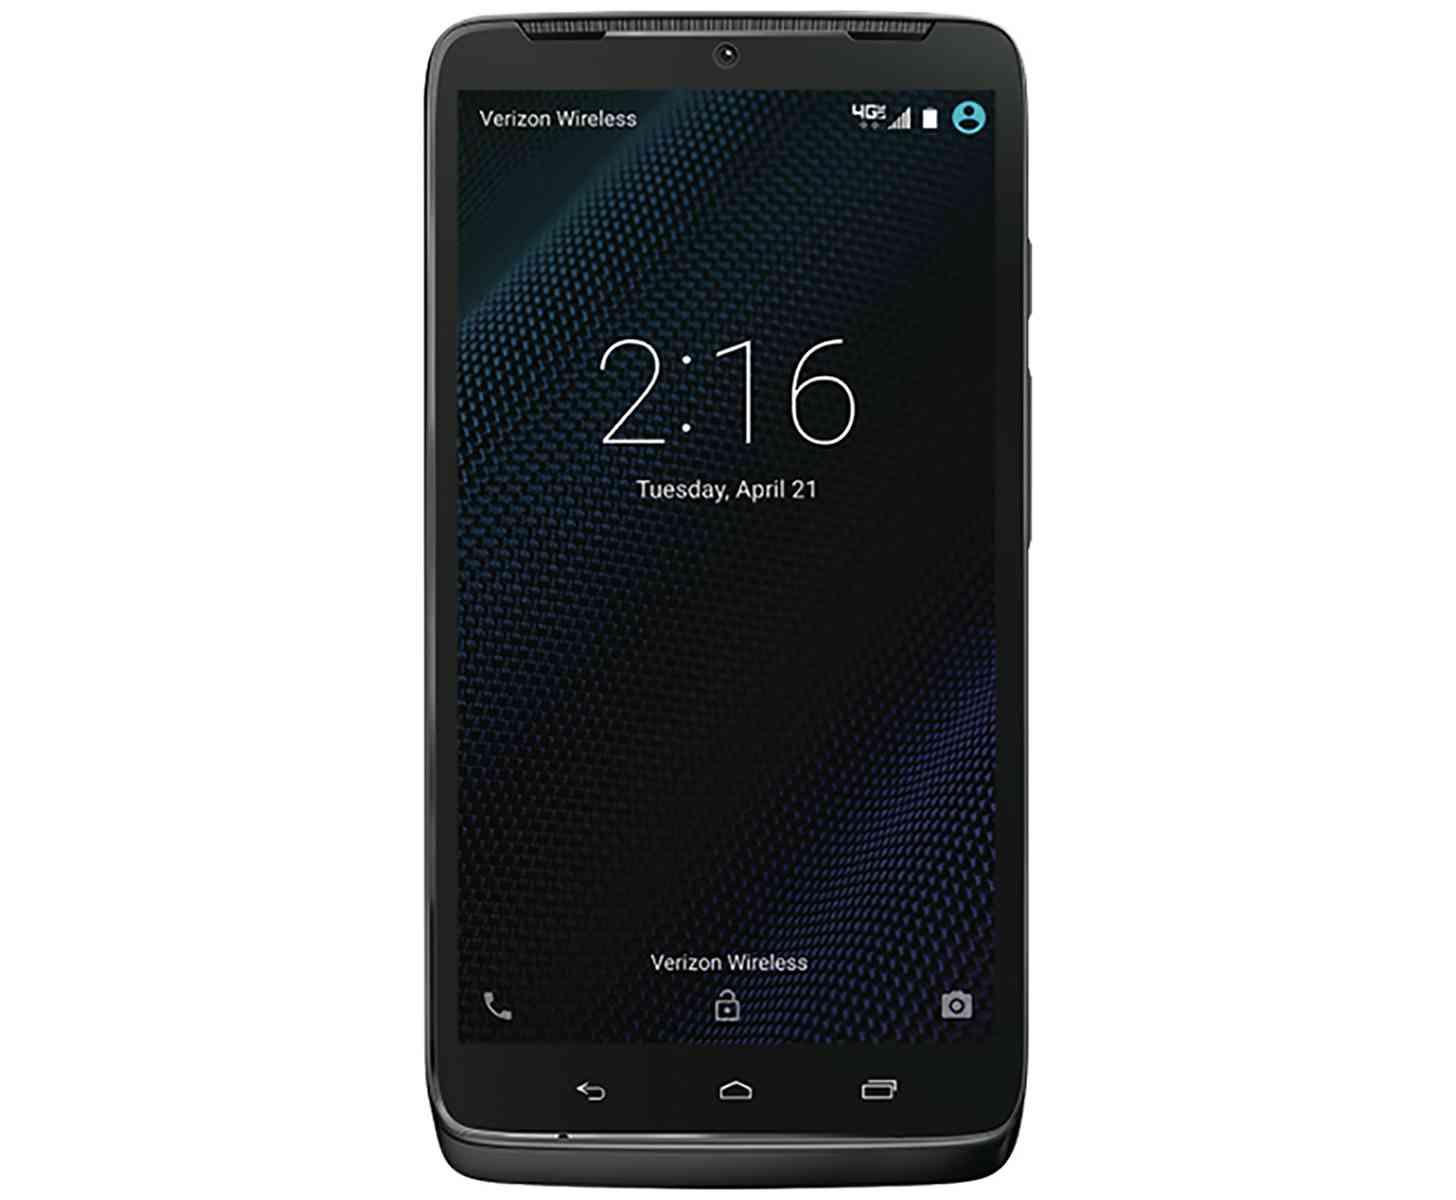 Motorola DROID Turbo Android 5.1 Lollipop